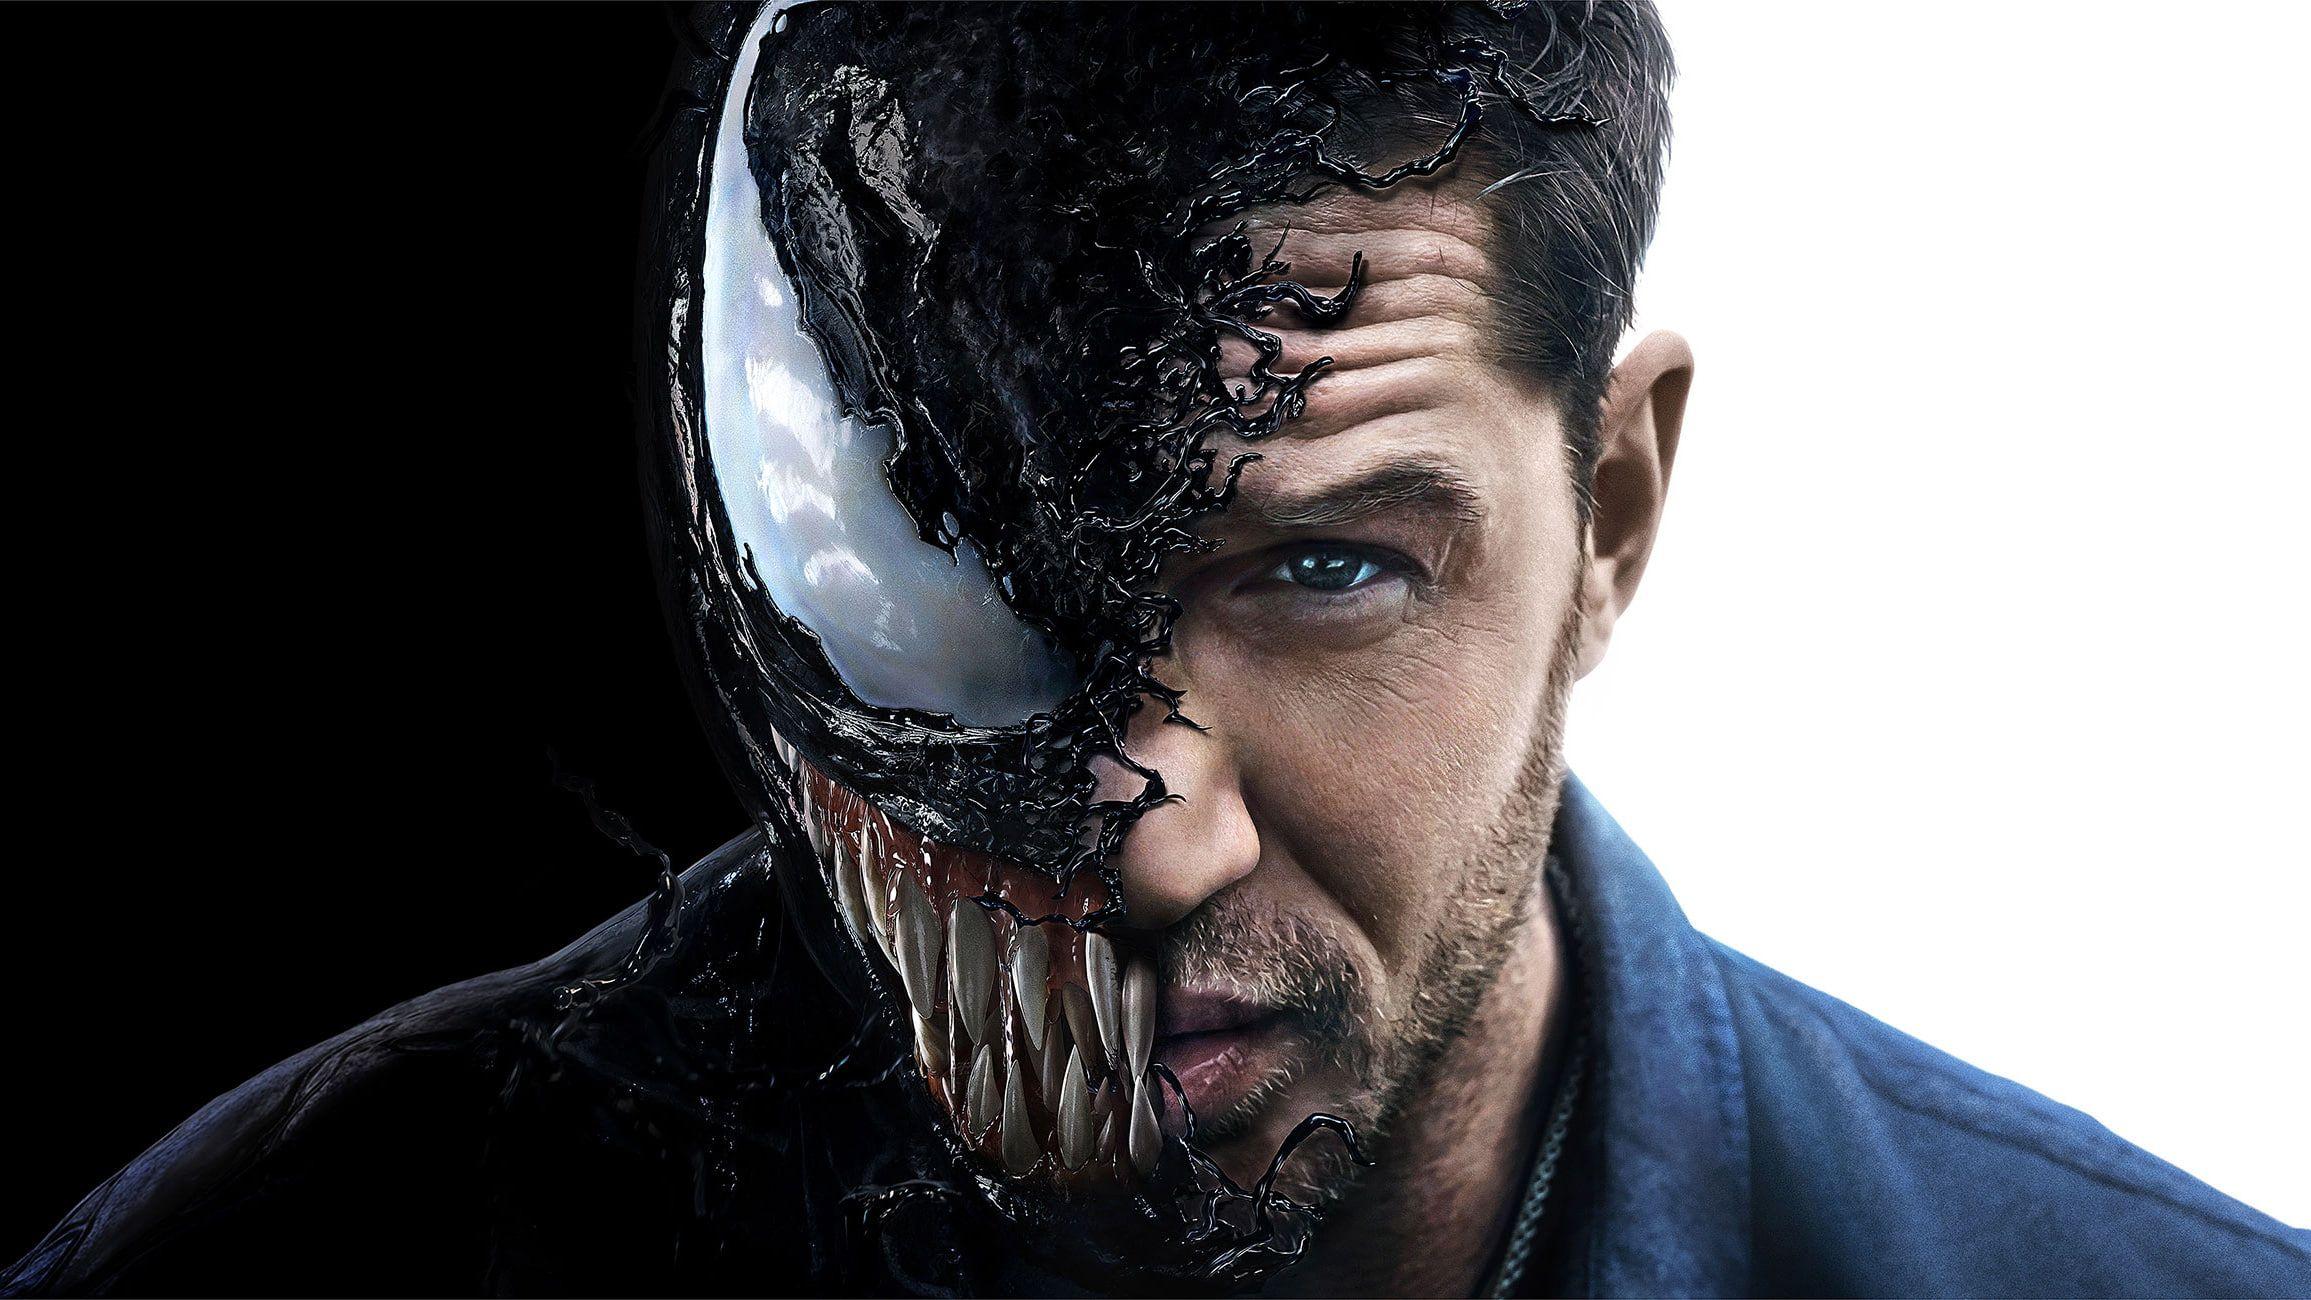 Venom Movie Venom 2018 Movies Movies Hd Poster Tom Hardy 1080p Wallpaper Hdwallpaper Desktop In 2020 Deadpool Movie Wallpaper Venom Movie Movie Wallpapers